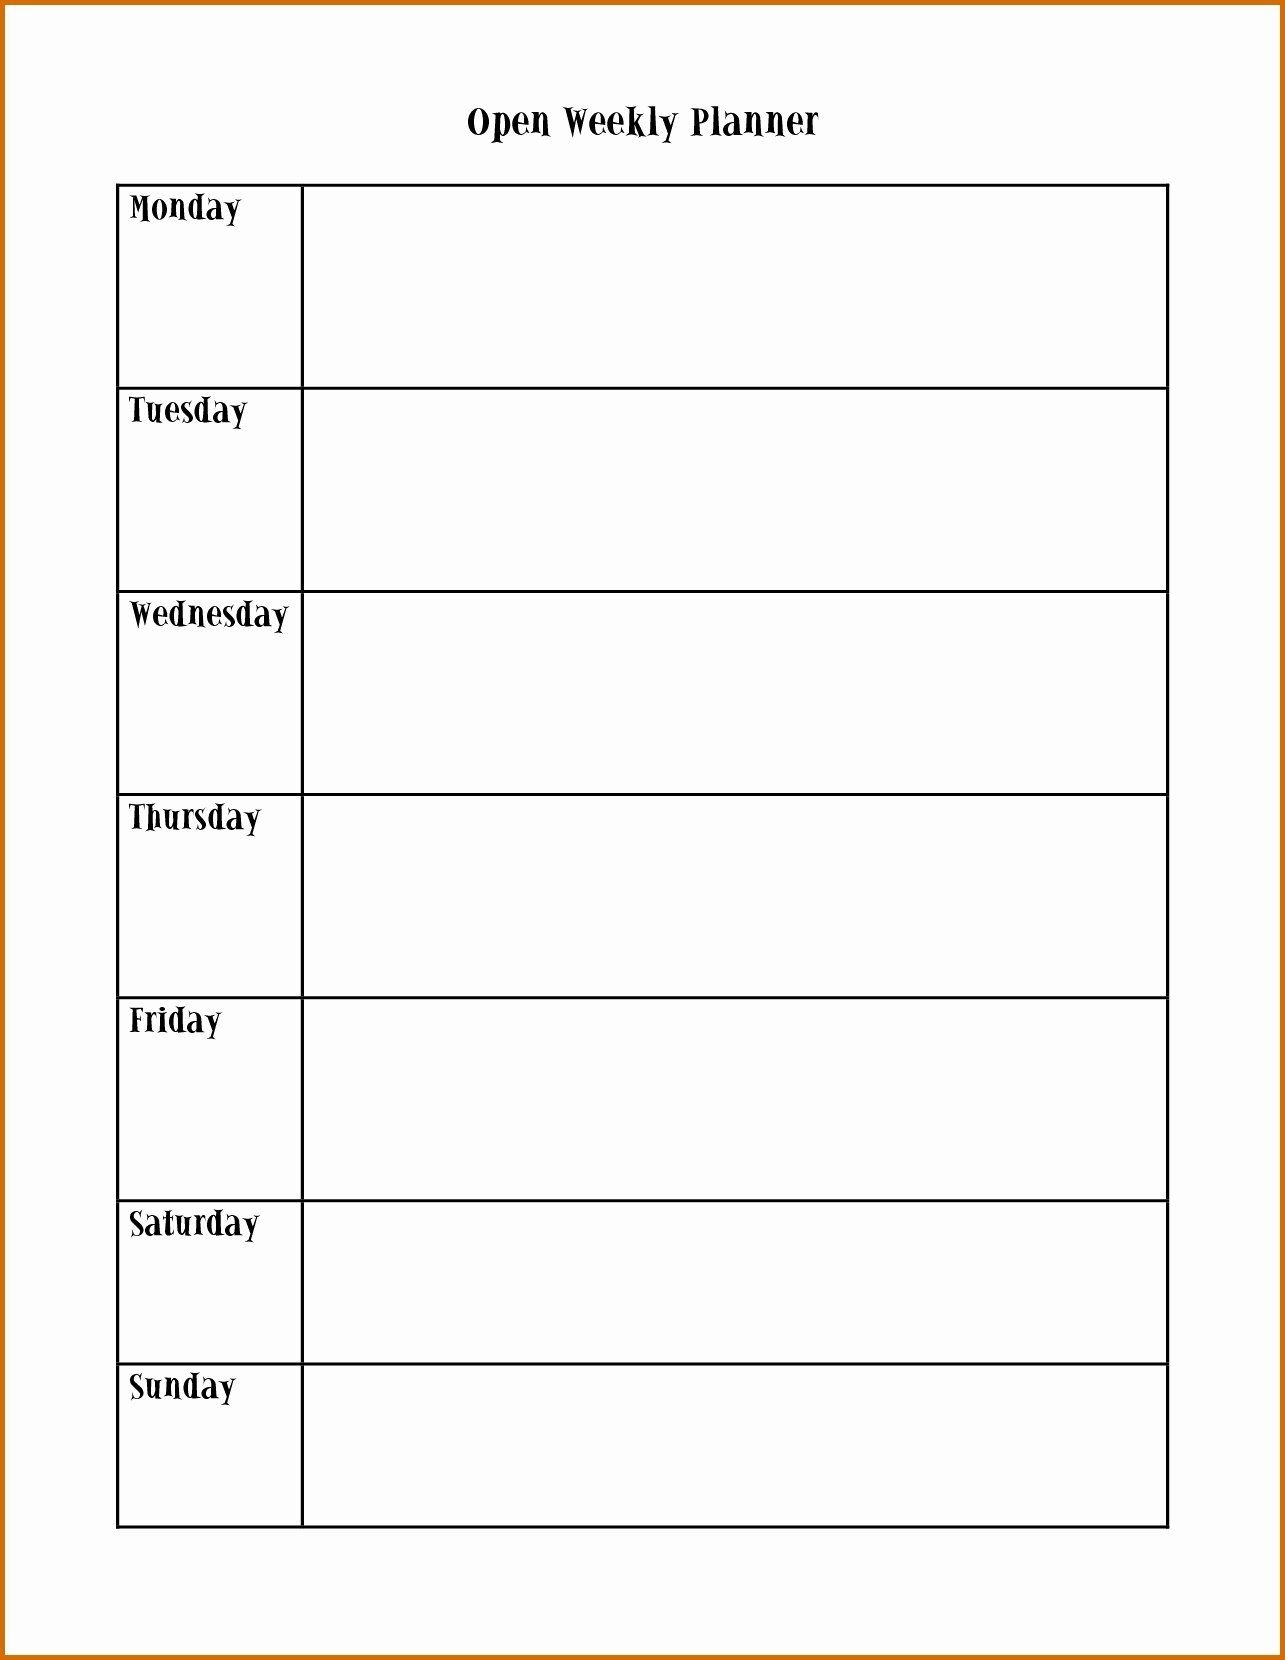 Weekly Calendar Monday Through Friday In 2020 | Monthly Calendar Template, Calendar Template